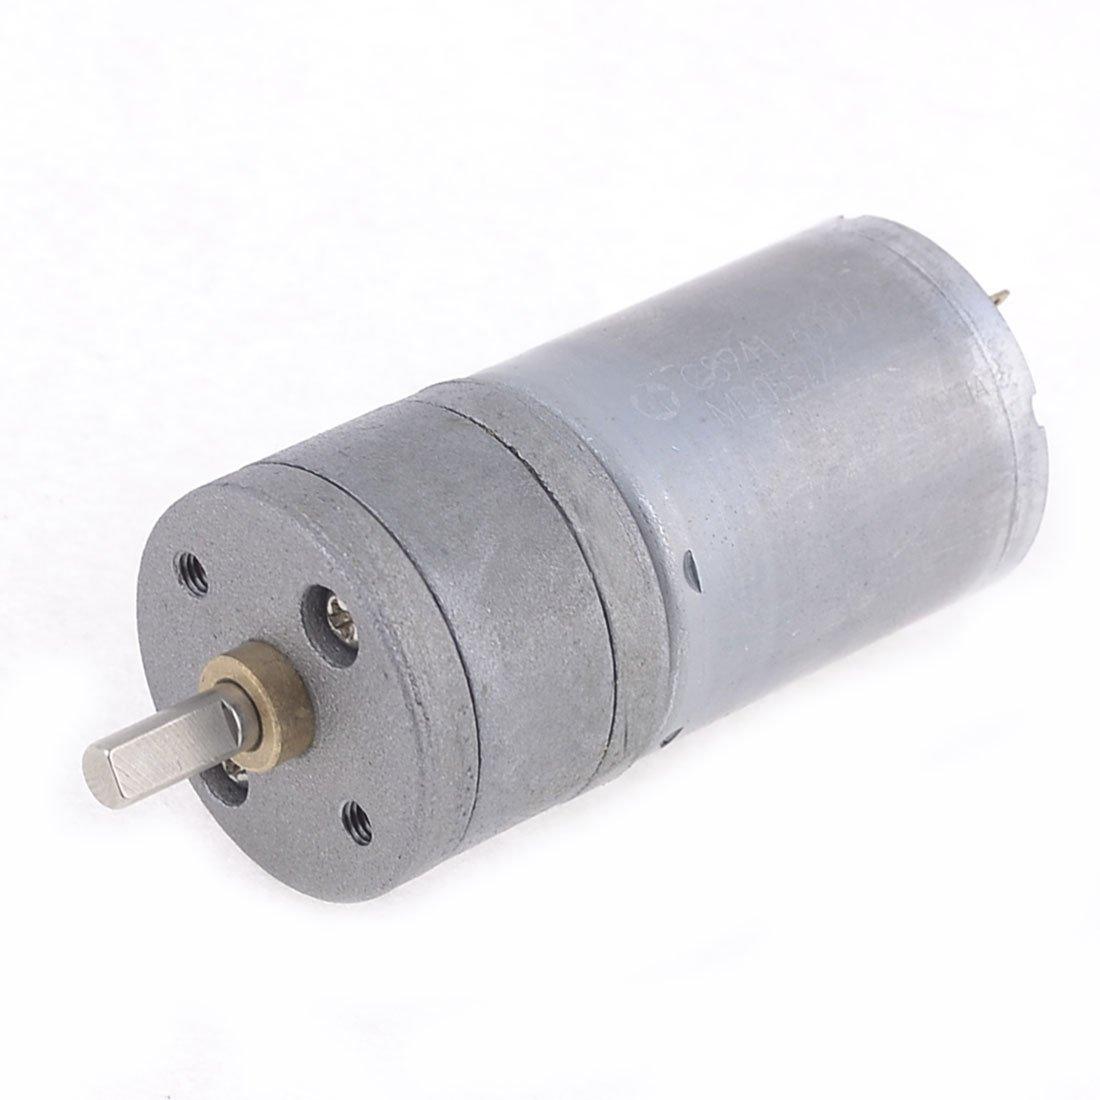 uxcell Gear Motor with Encoder DC 12V 55RPM Gear Ratio 78:1 D Shaft Metal Encoder Gear Motor Silver 25Dx53L mm for Robot RC Car Model DIY Engine Toy